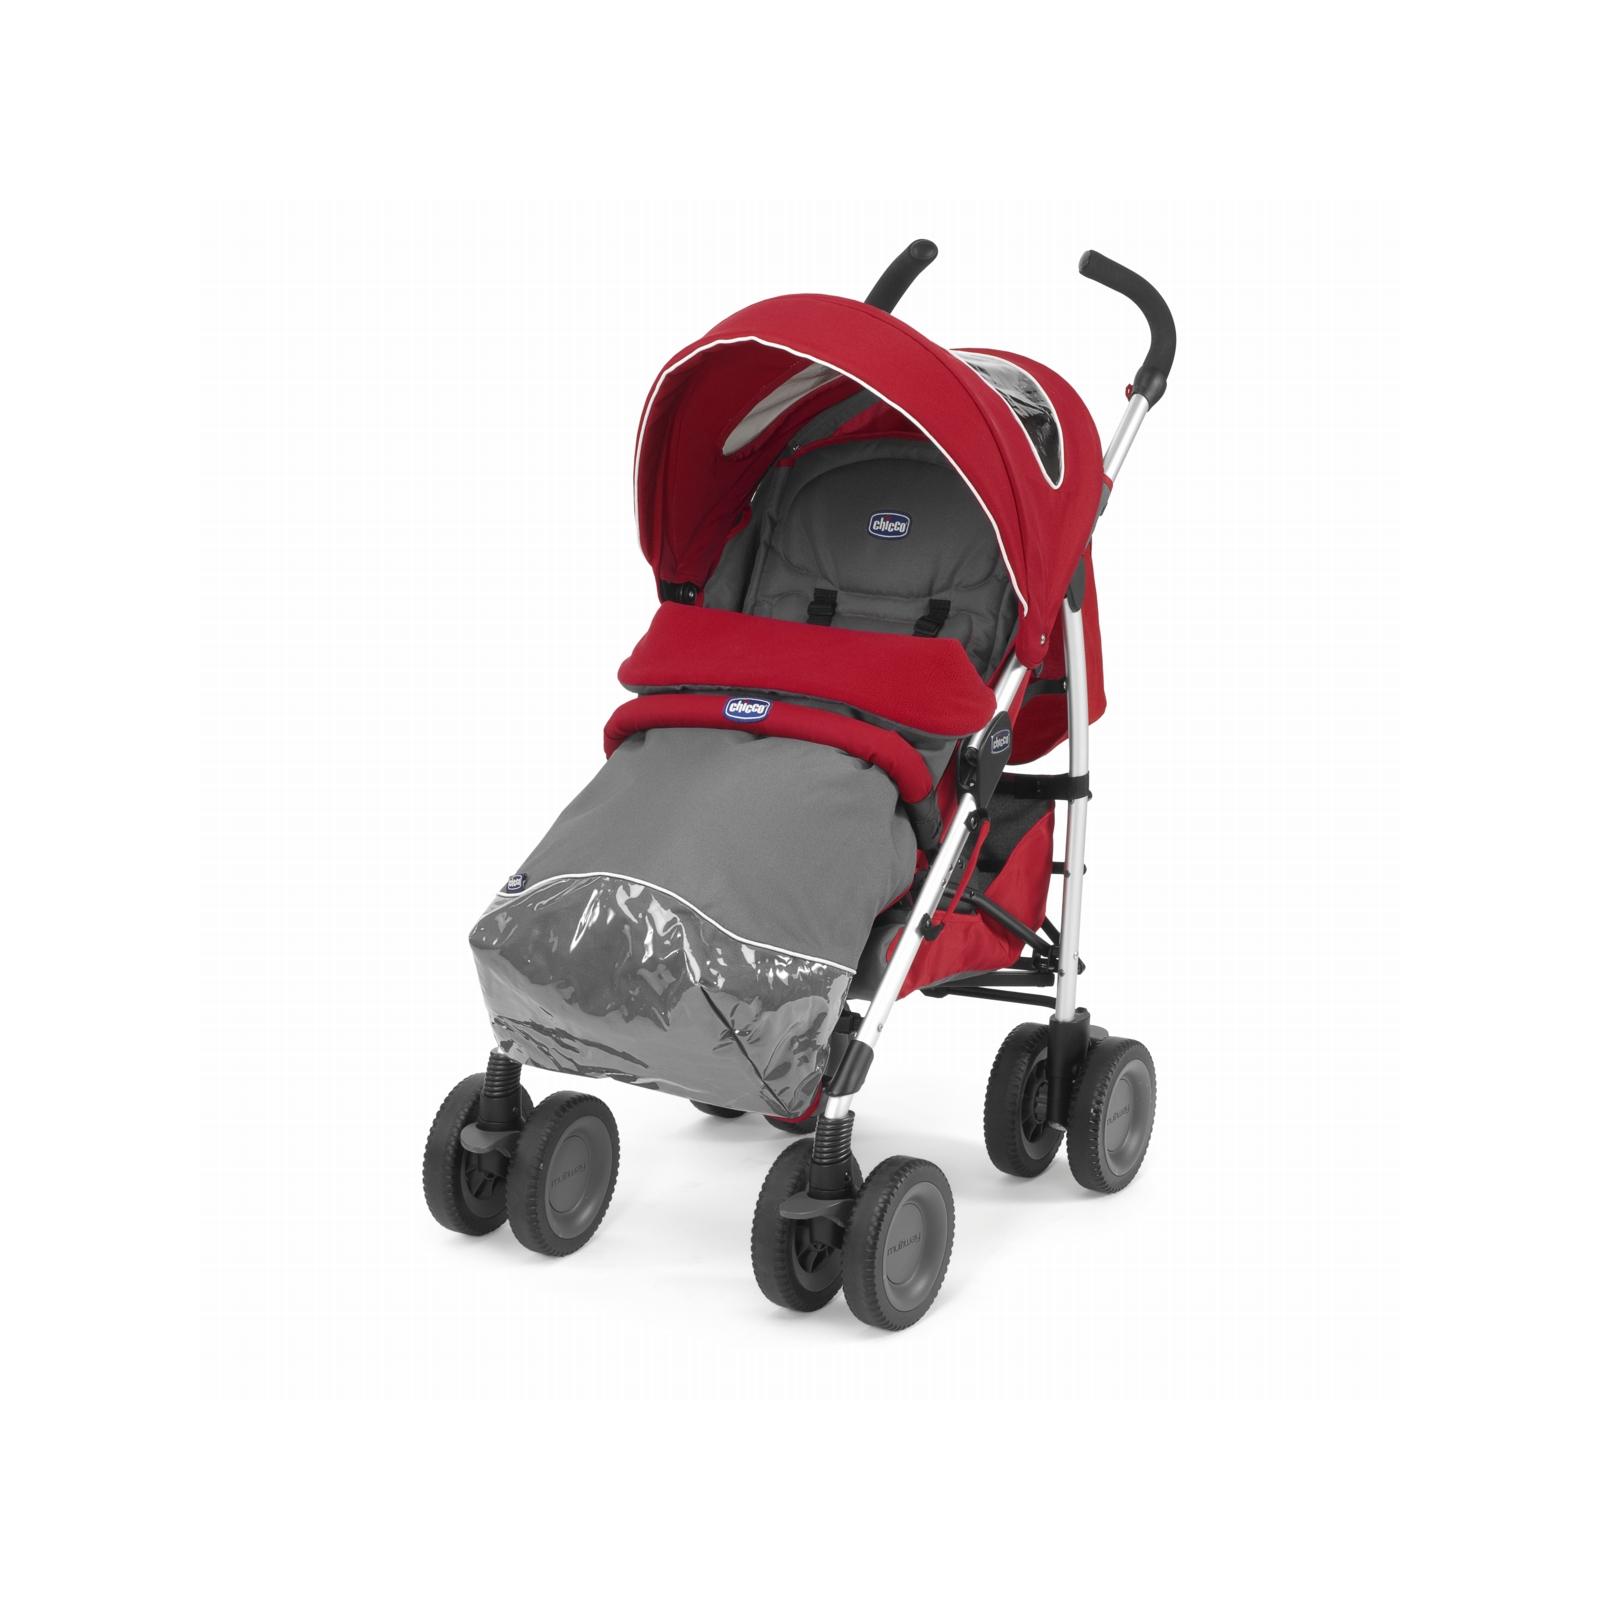 Коляска Chicco Multiway Evo Stroller Red (79315.70) изображение 5